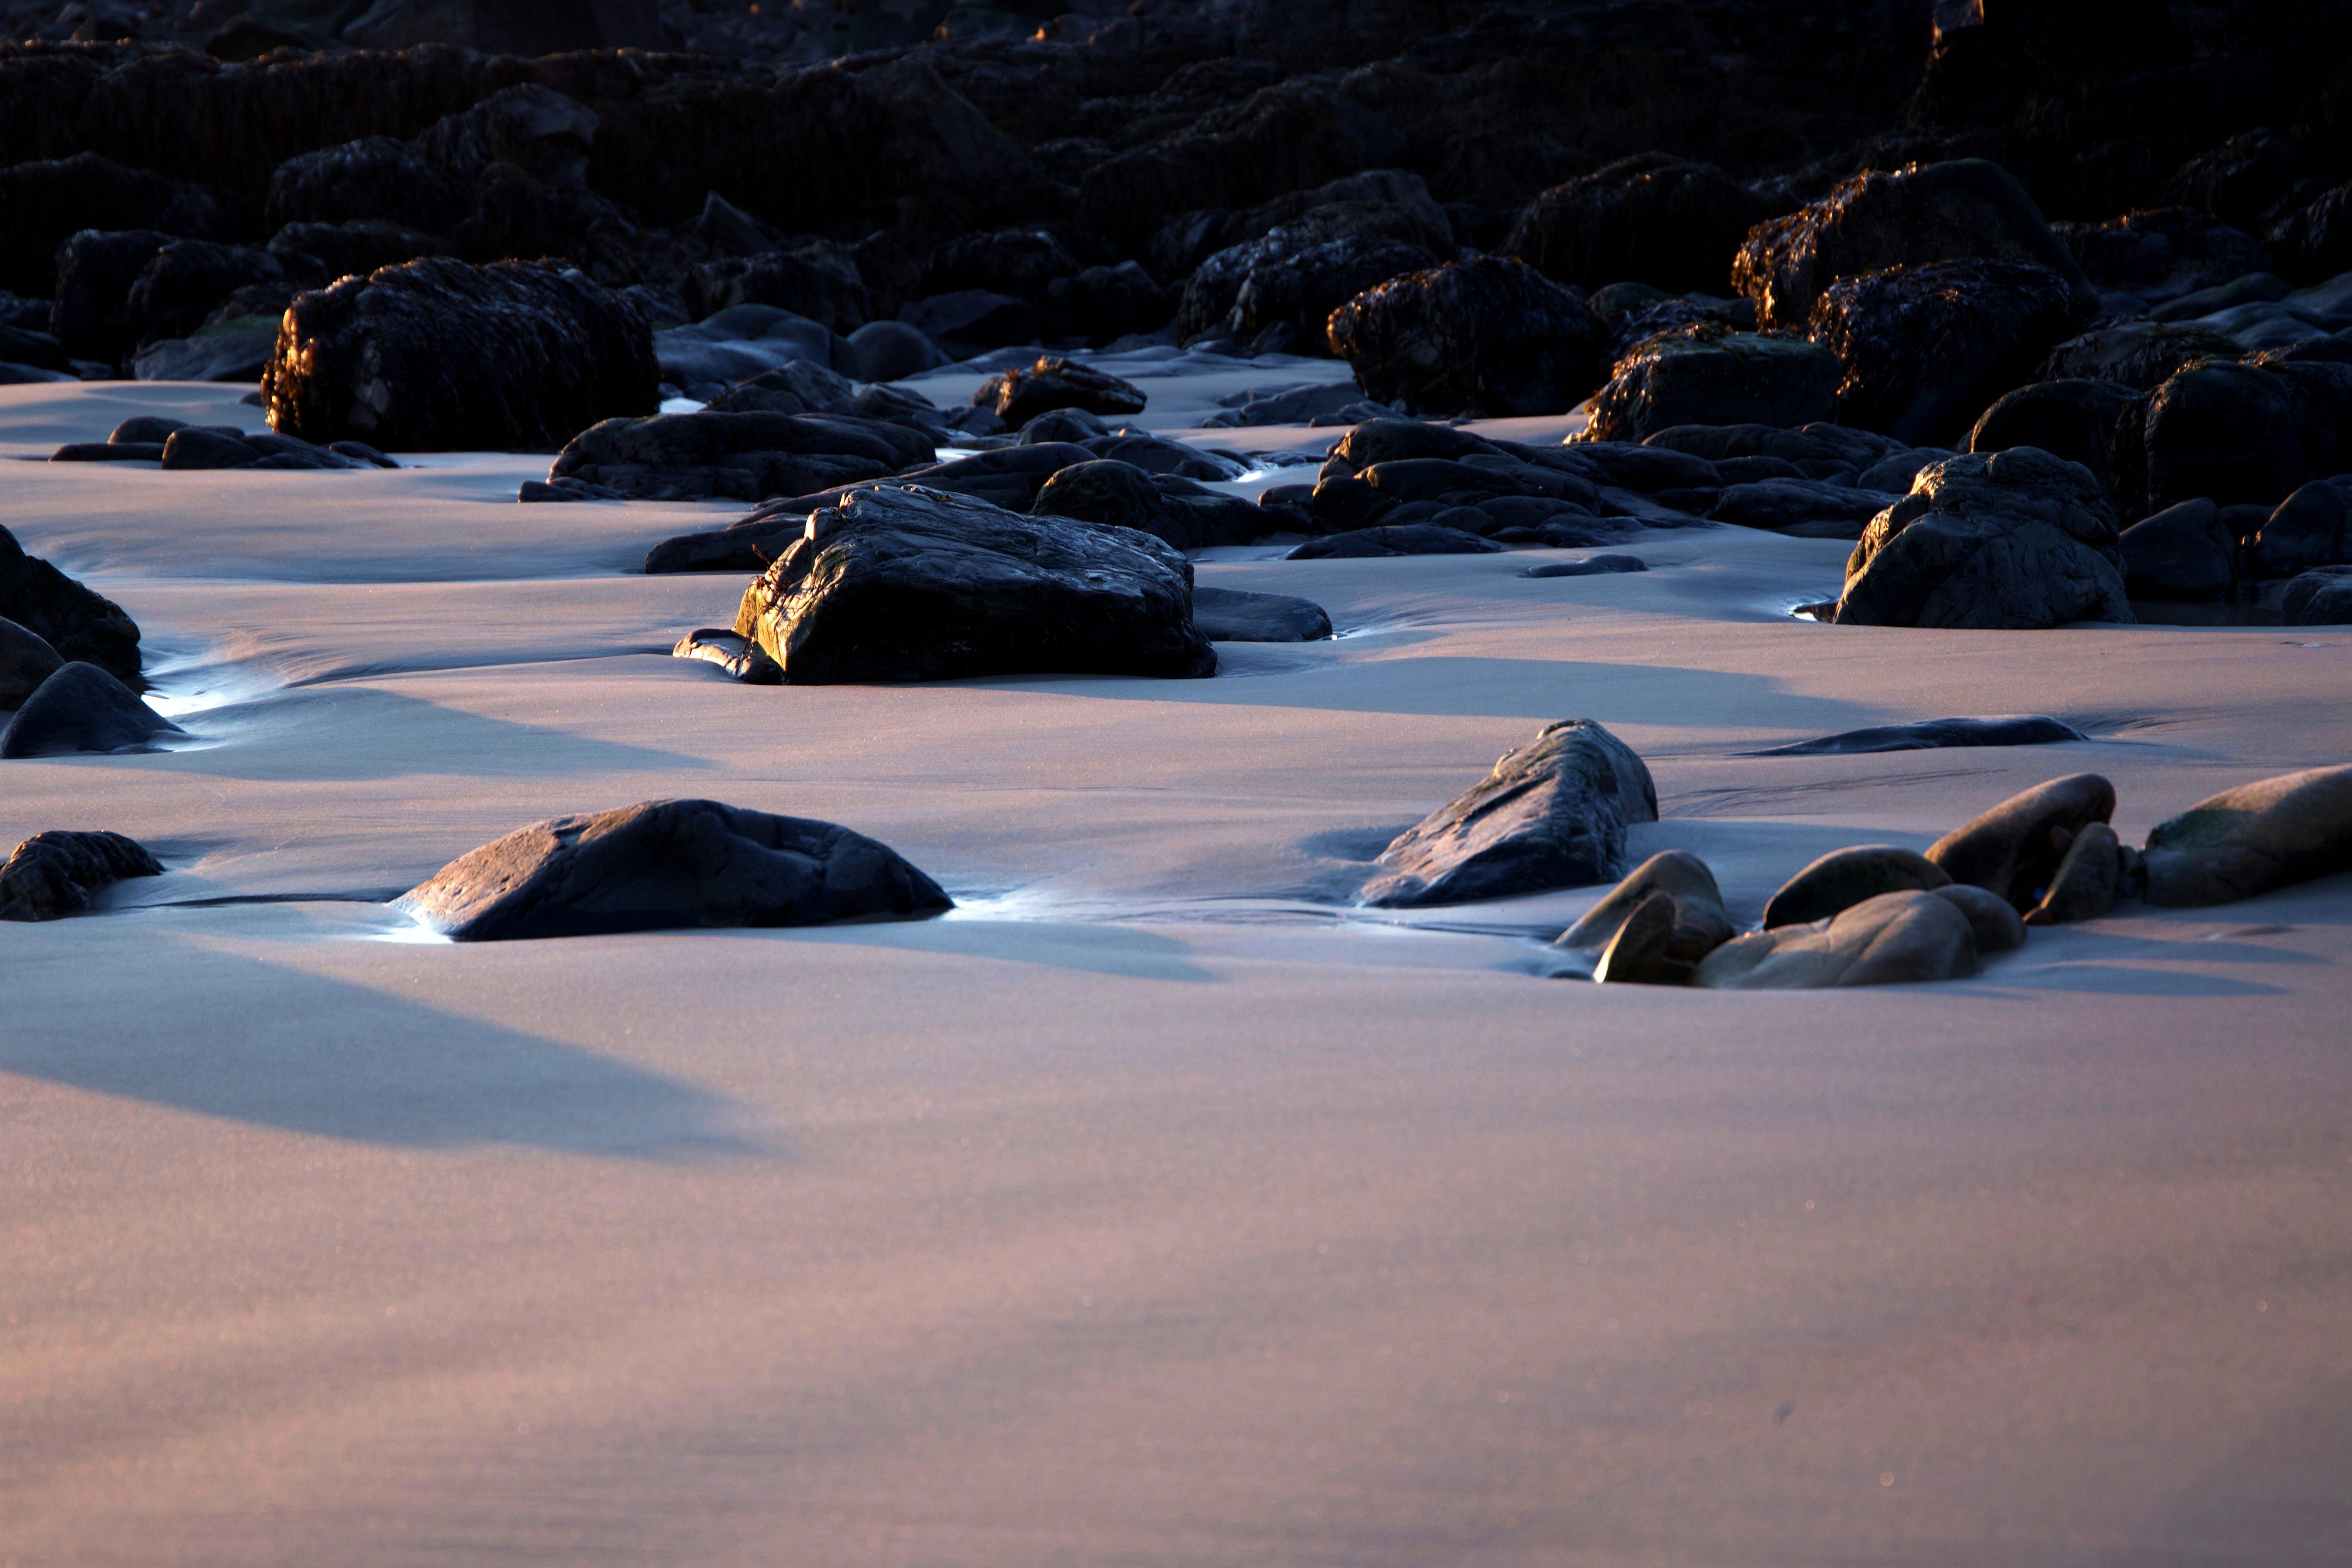 Black Rocks on Sand during Daytime